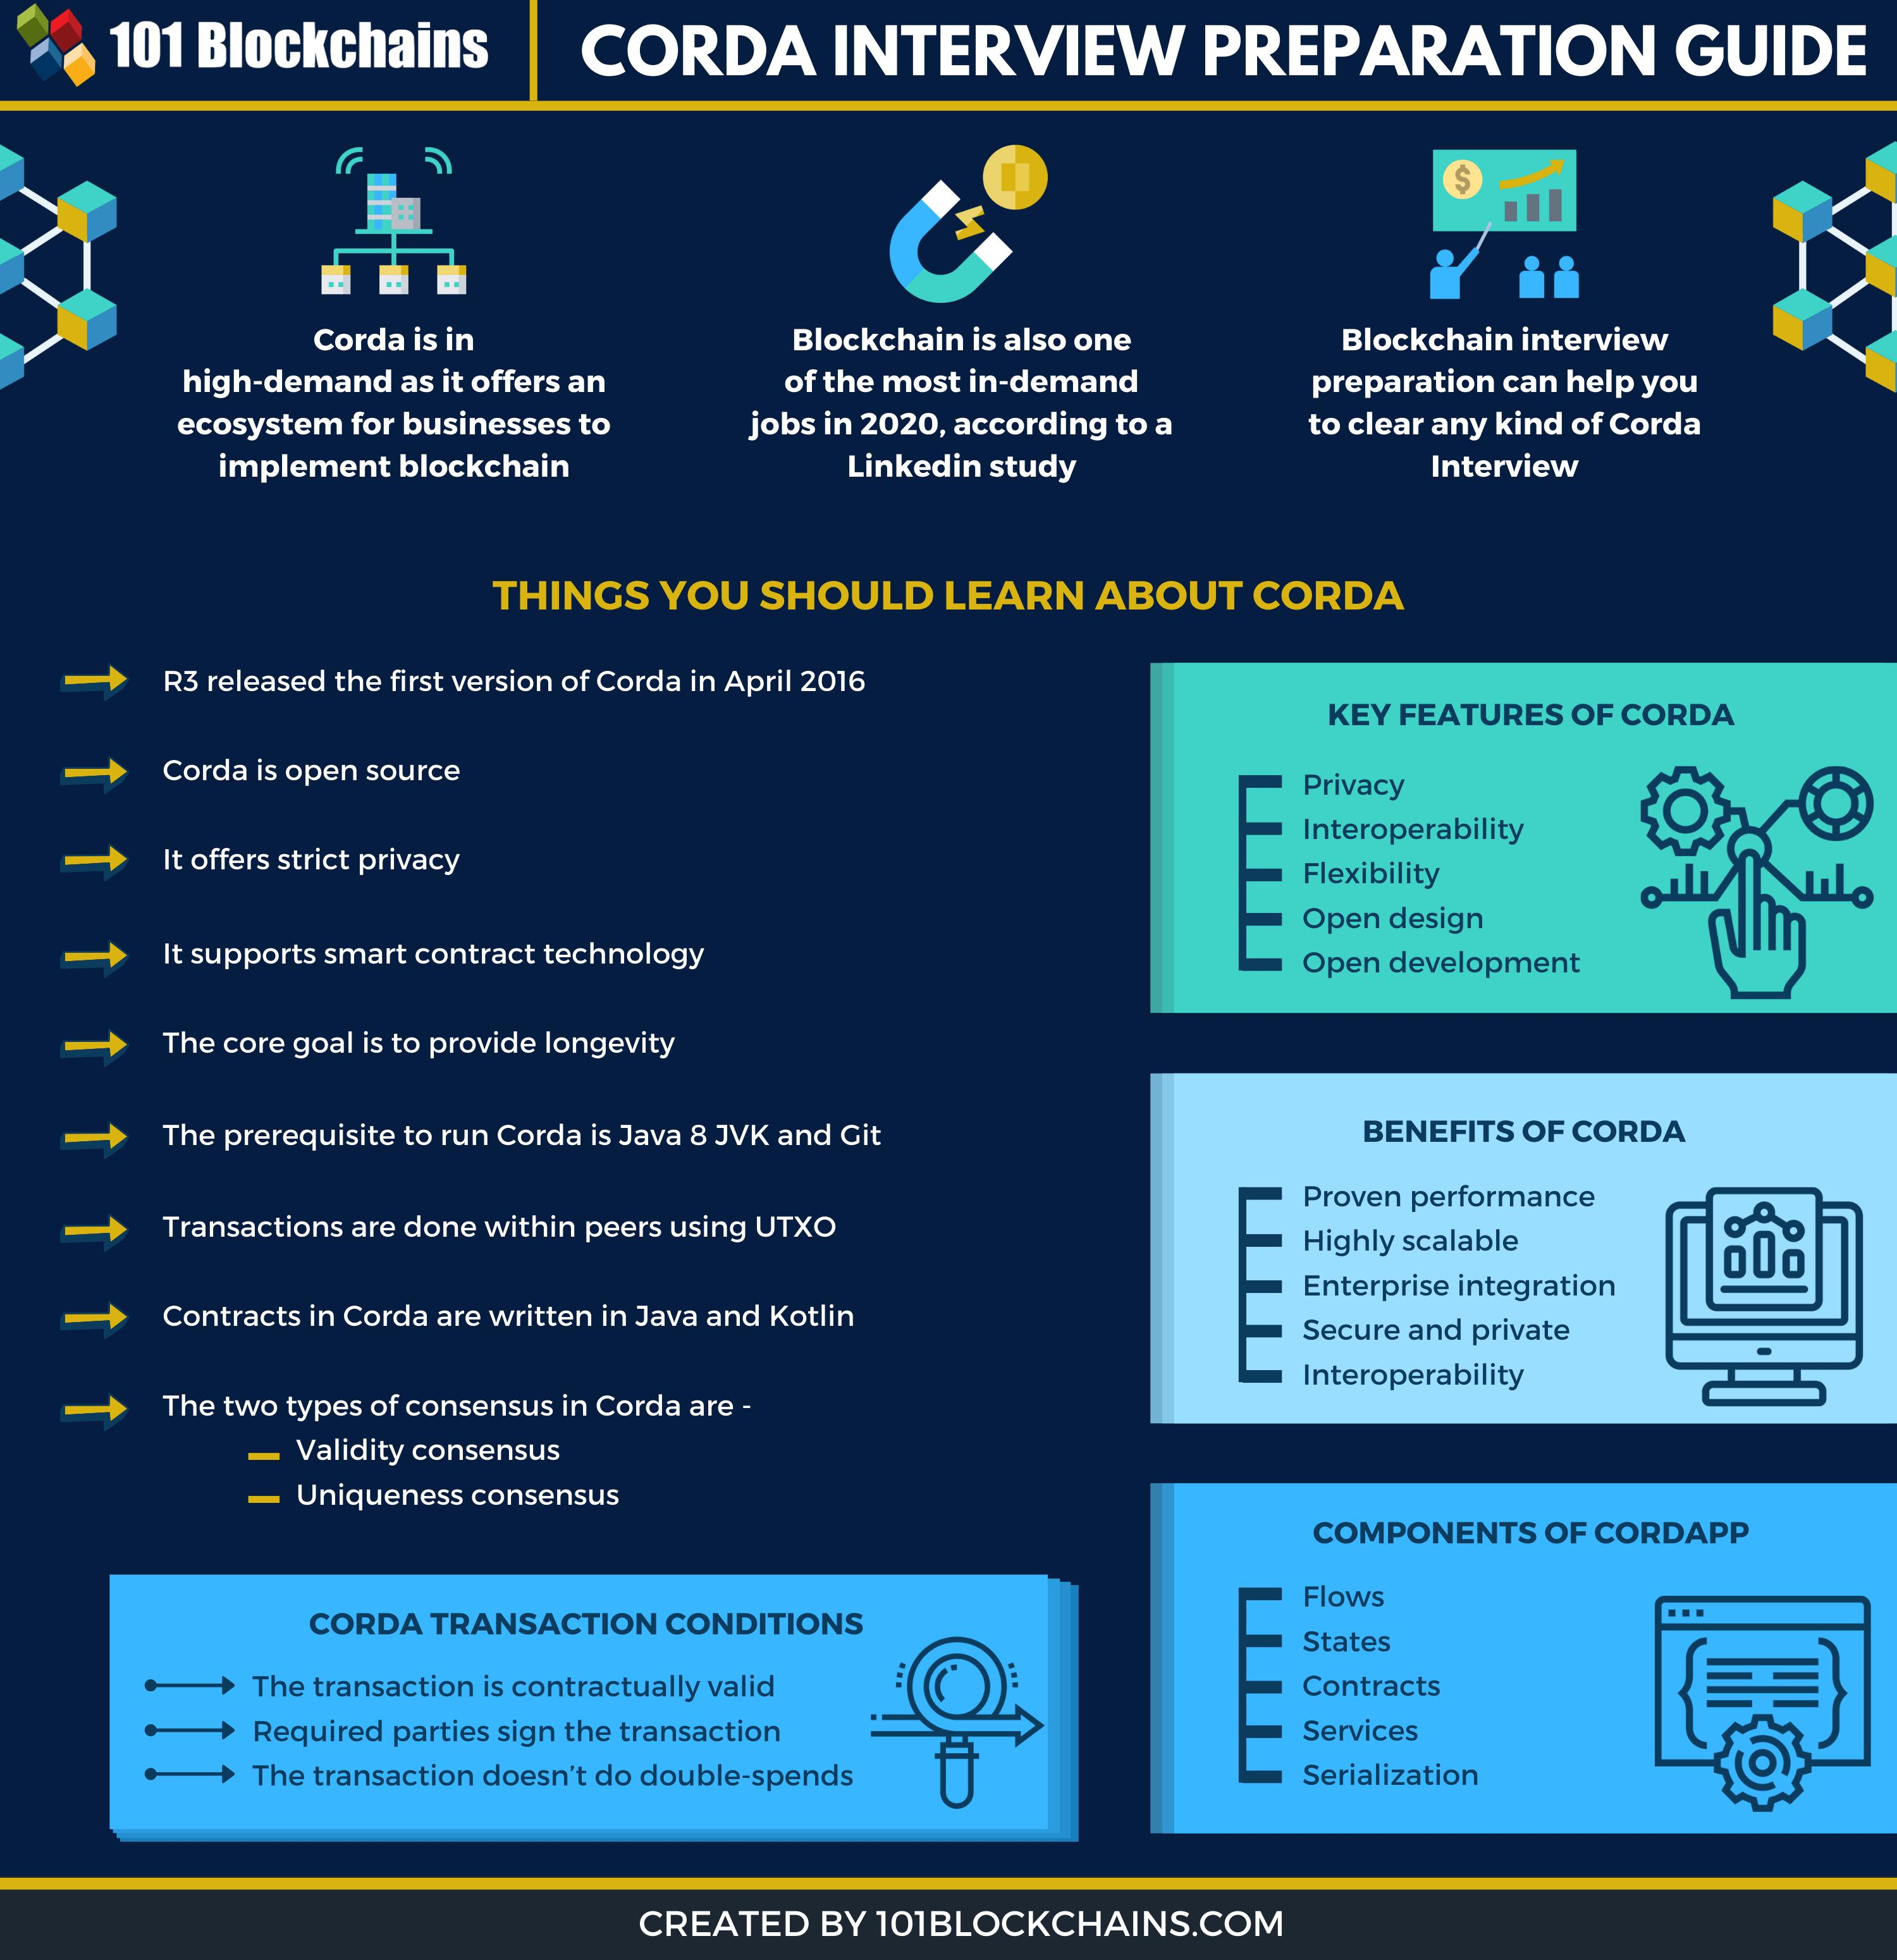 CORDA INTERVIEW